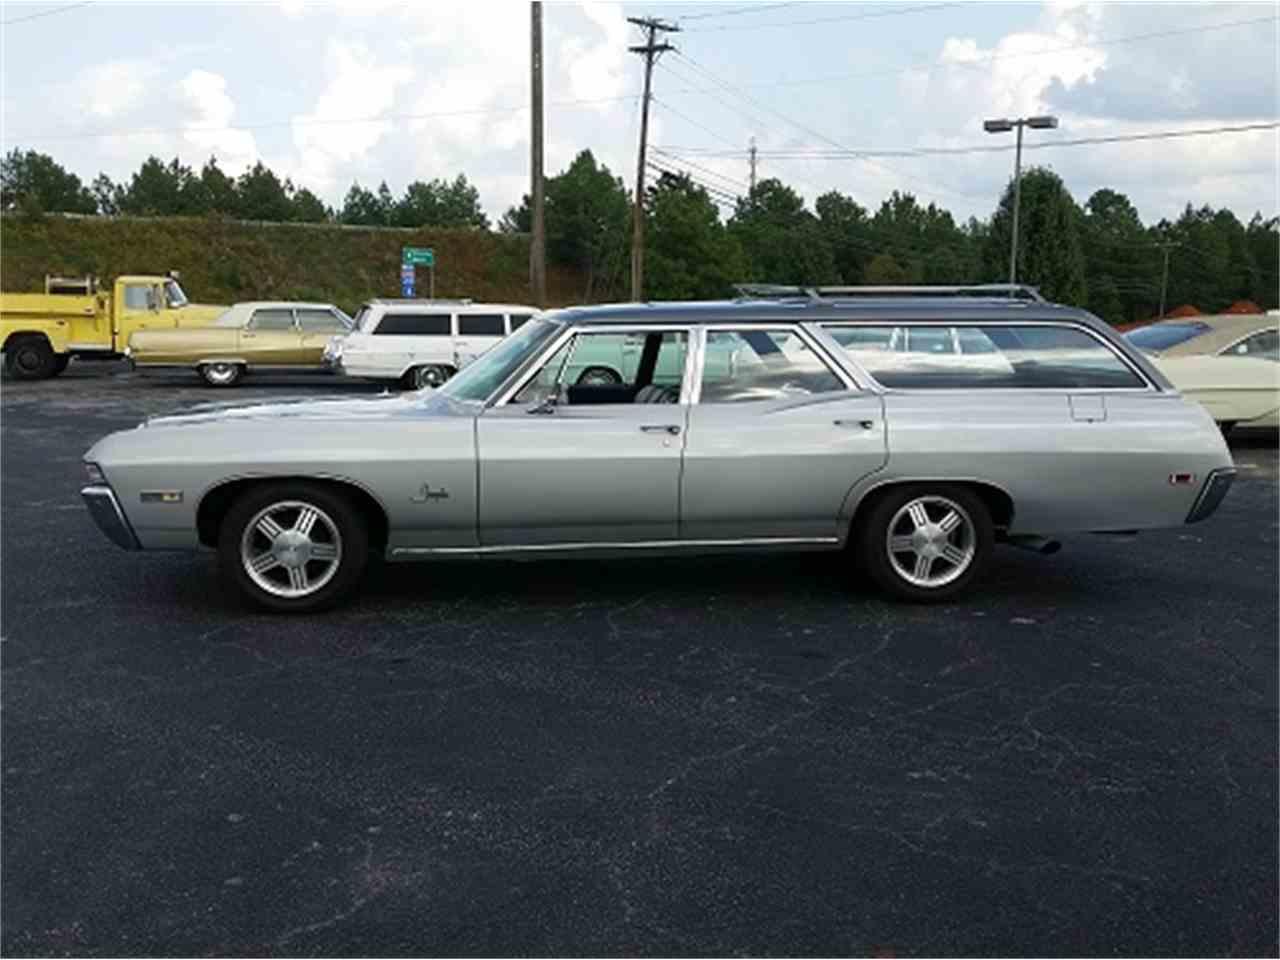 Impala 1968 chevy impala parts 1968 Chevrolet Impala for Sale on ClassicCars.com